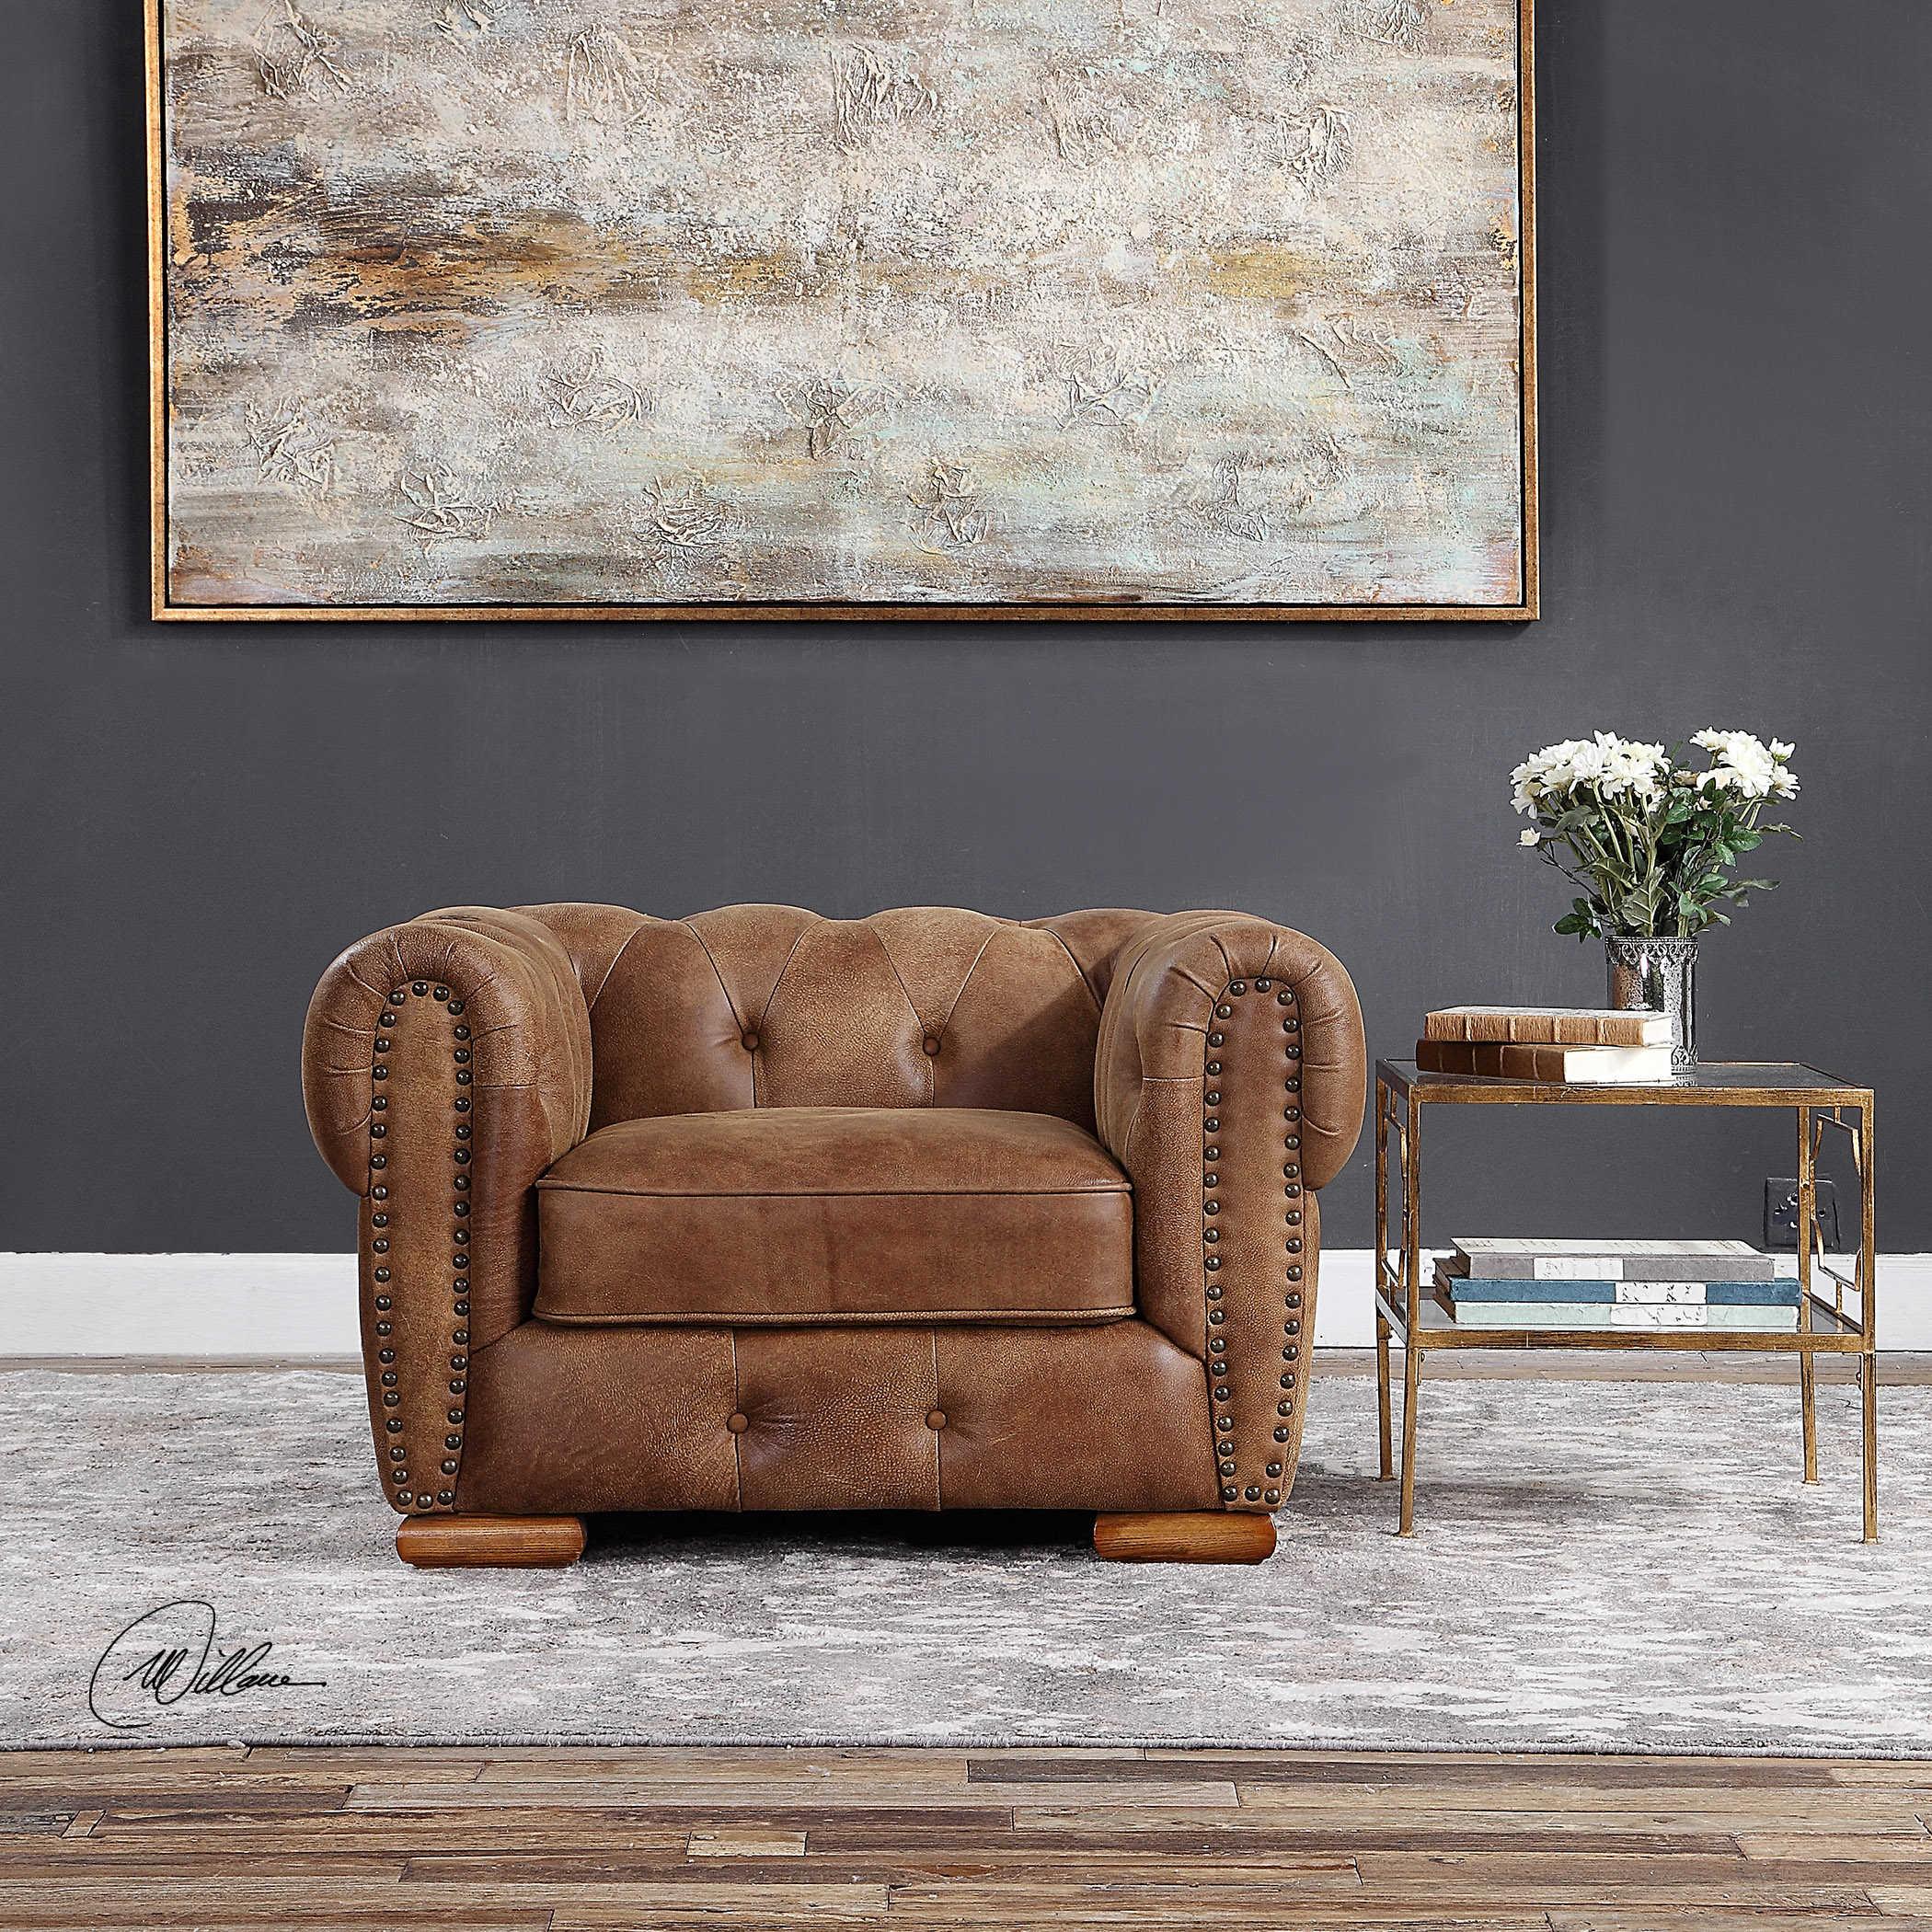 Miraculous Johnson Lounge Chair Machost Co Dining Chair Design Ideas Machostcouk